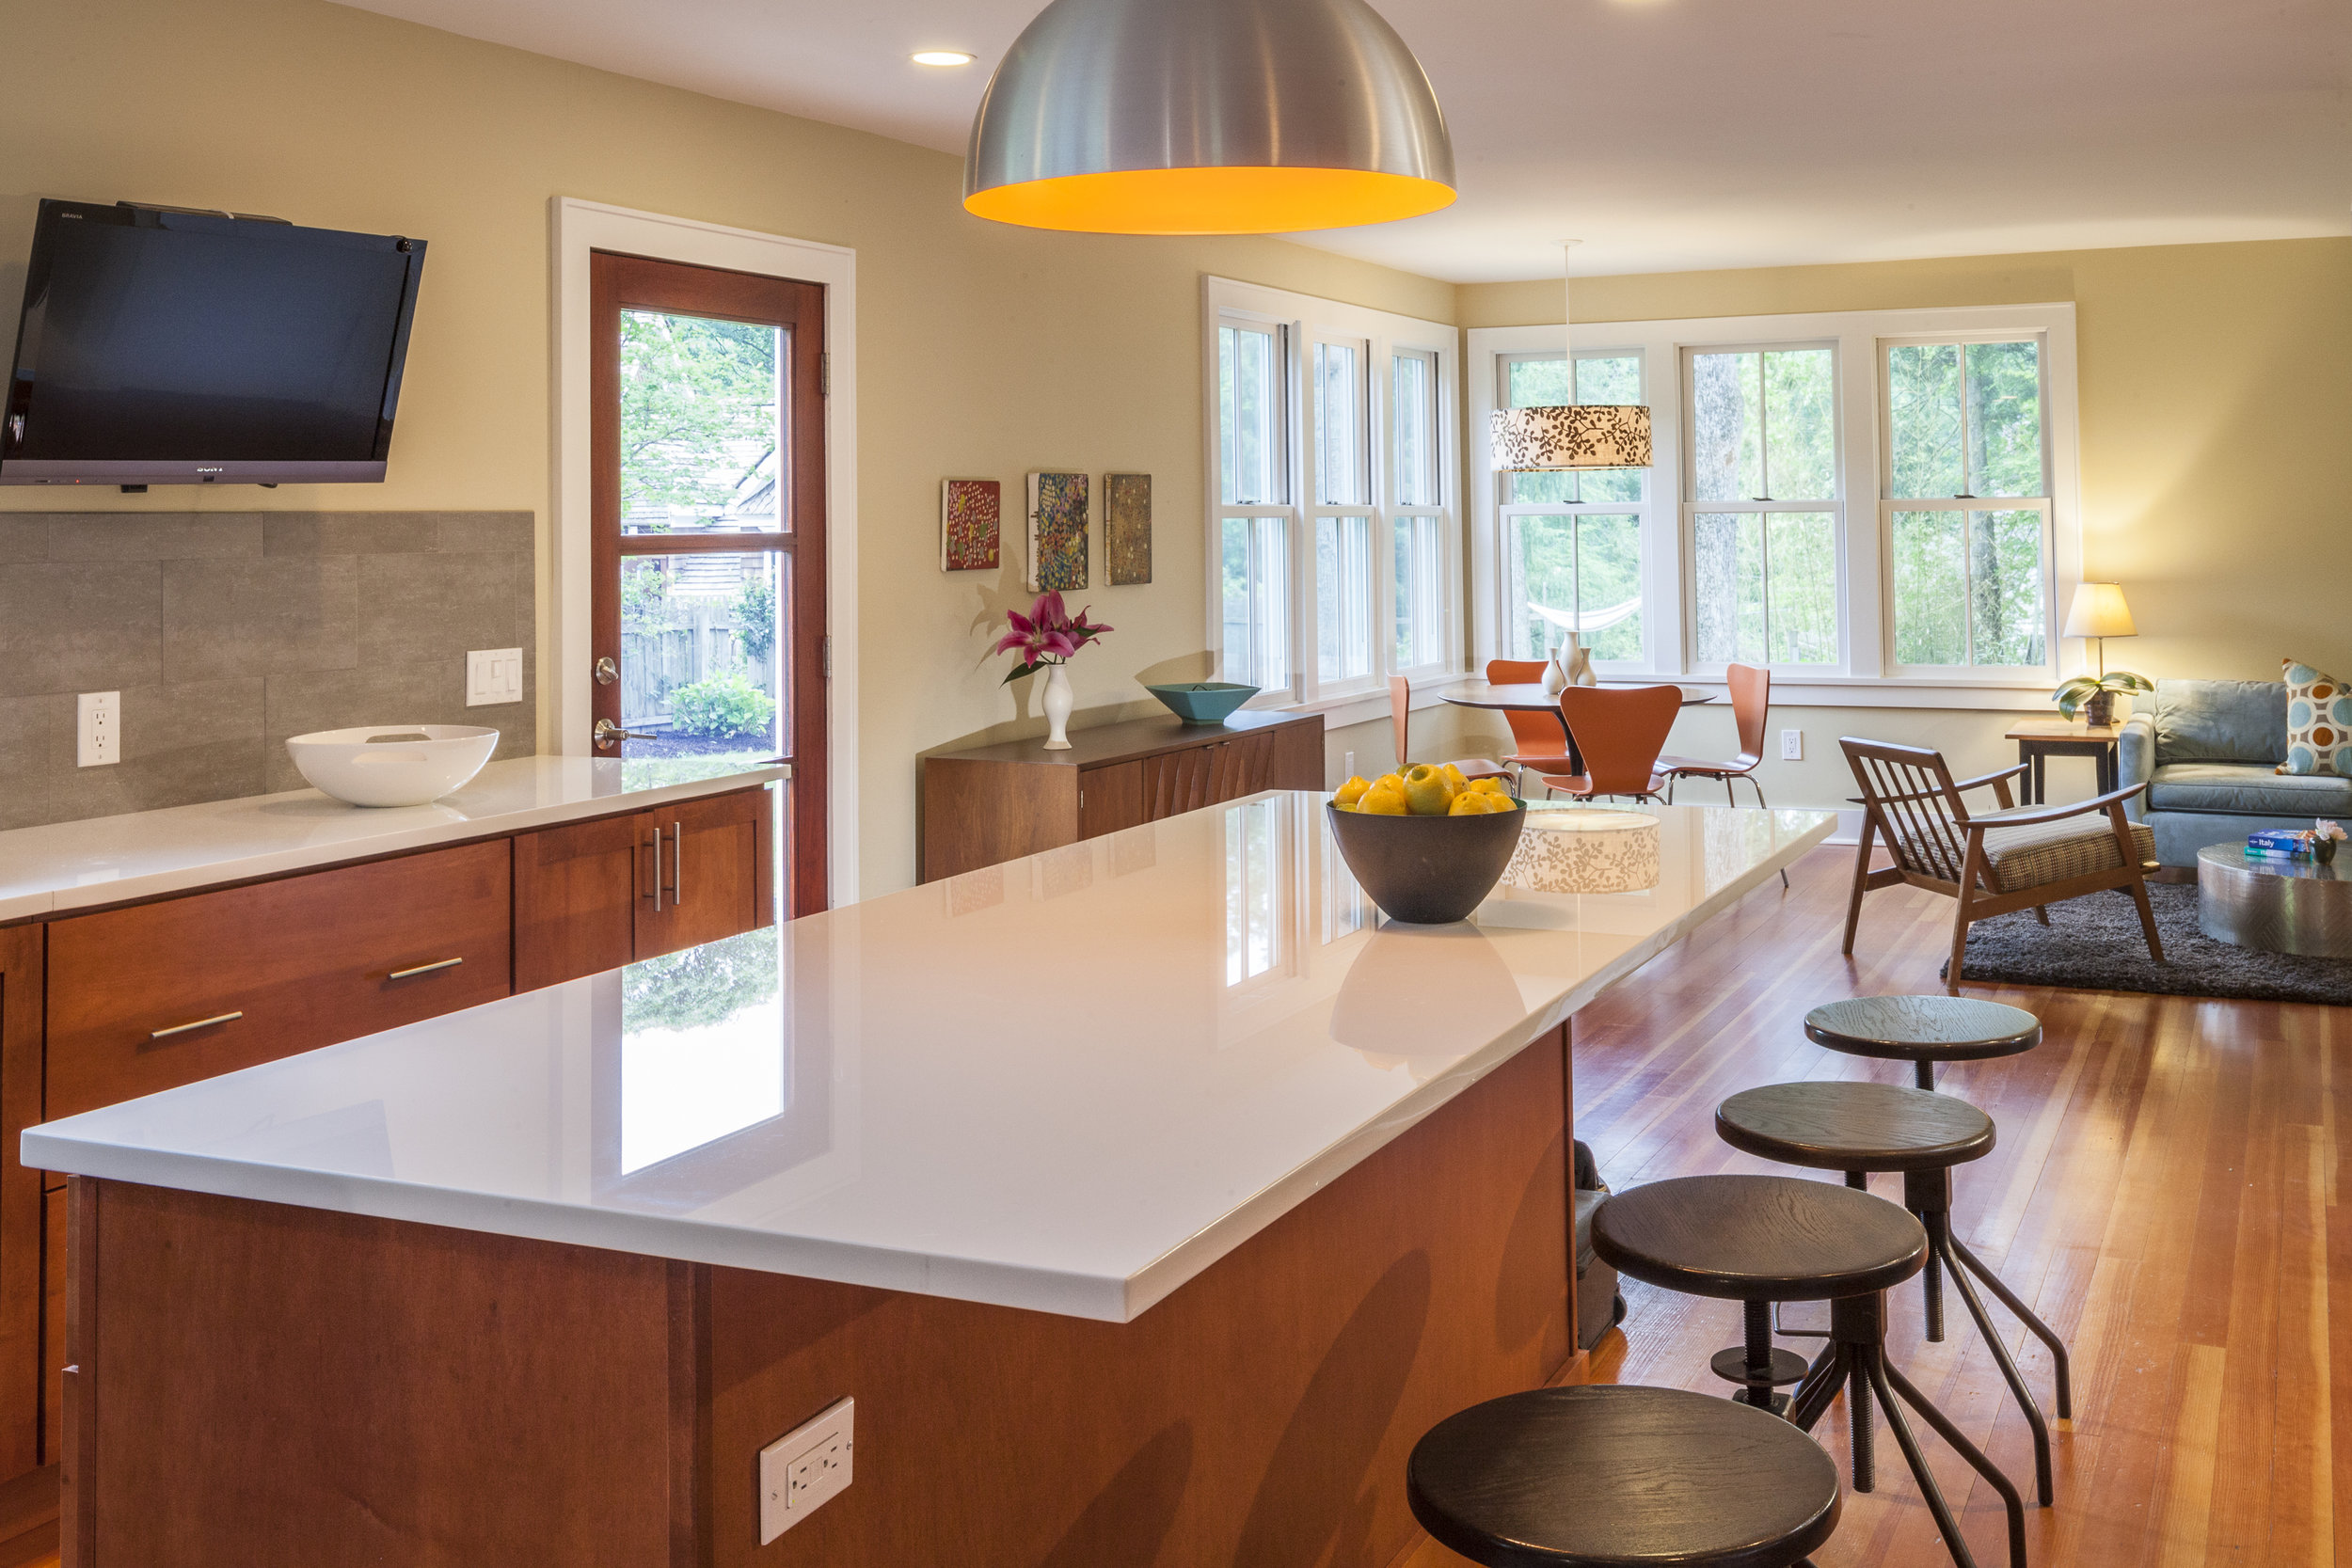 Modern, bright kitchen interior with chairs and kitchen island